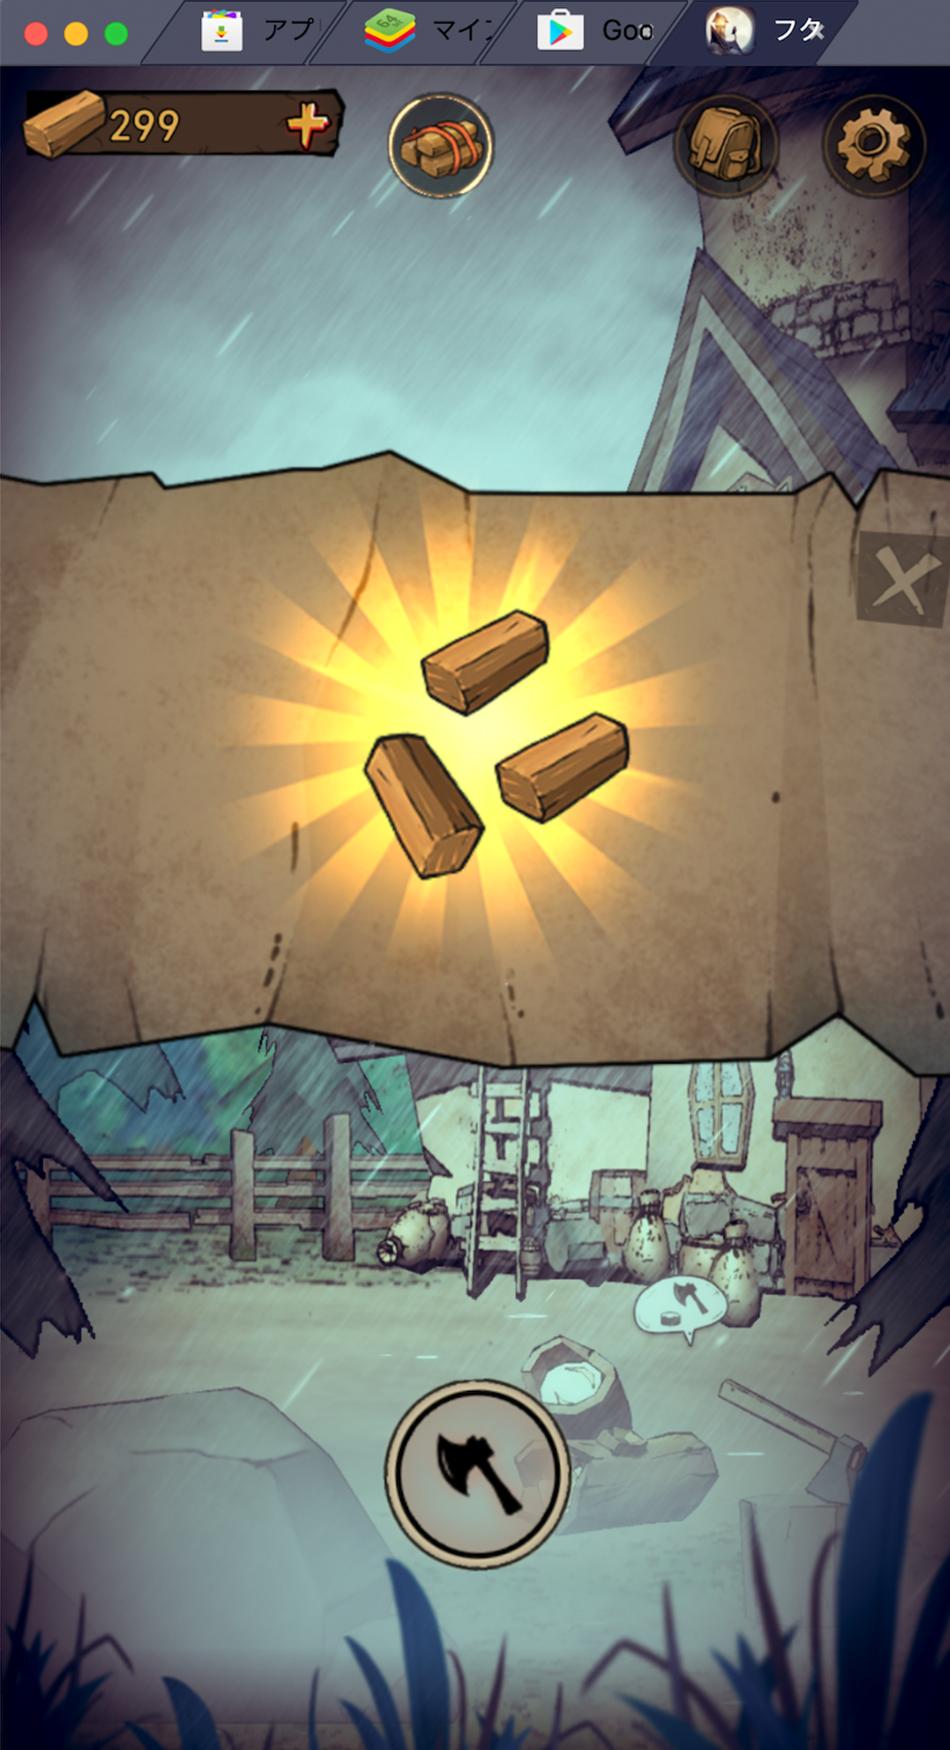 BlueStacksを使ってPCで『フクロウと灯台』を遊ぼう